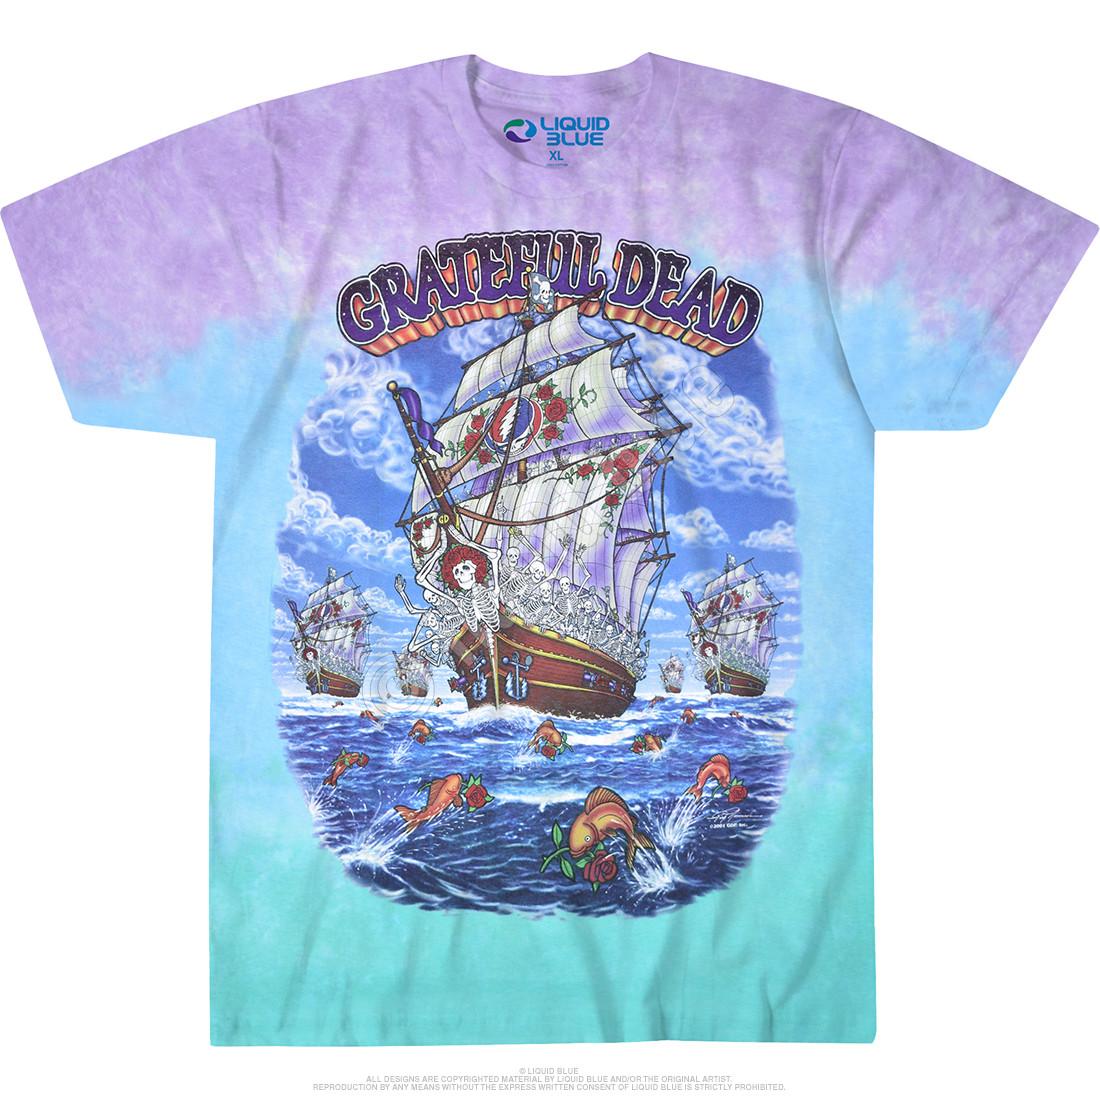 Ship Of Fools Tie-Dye T-Shirt